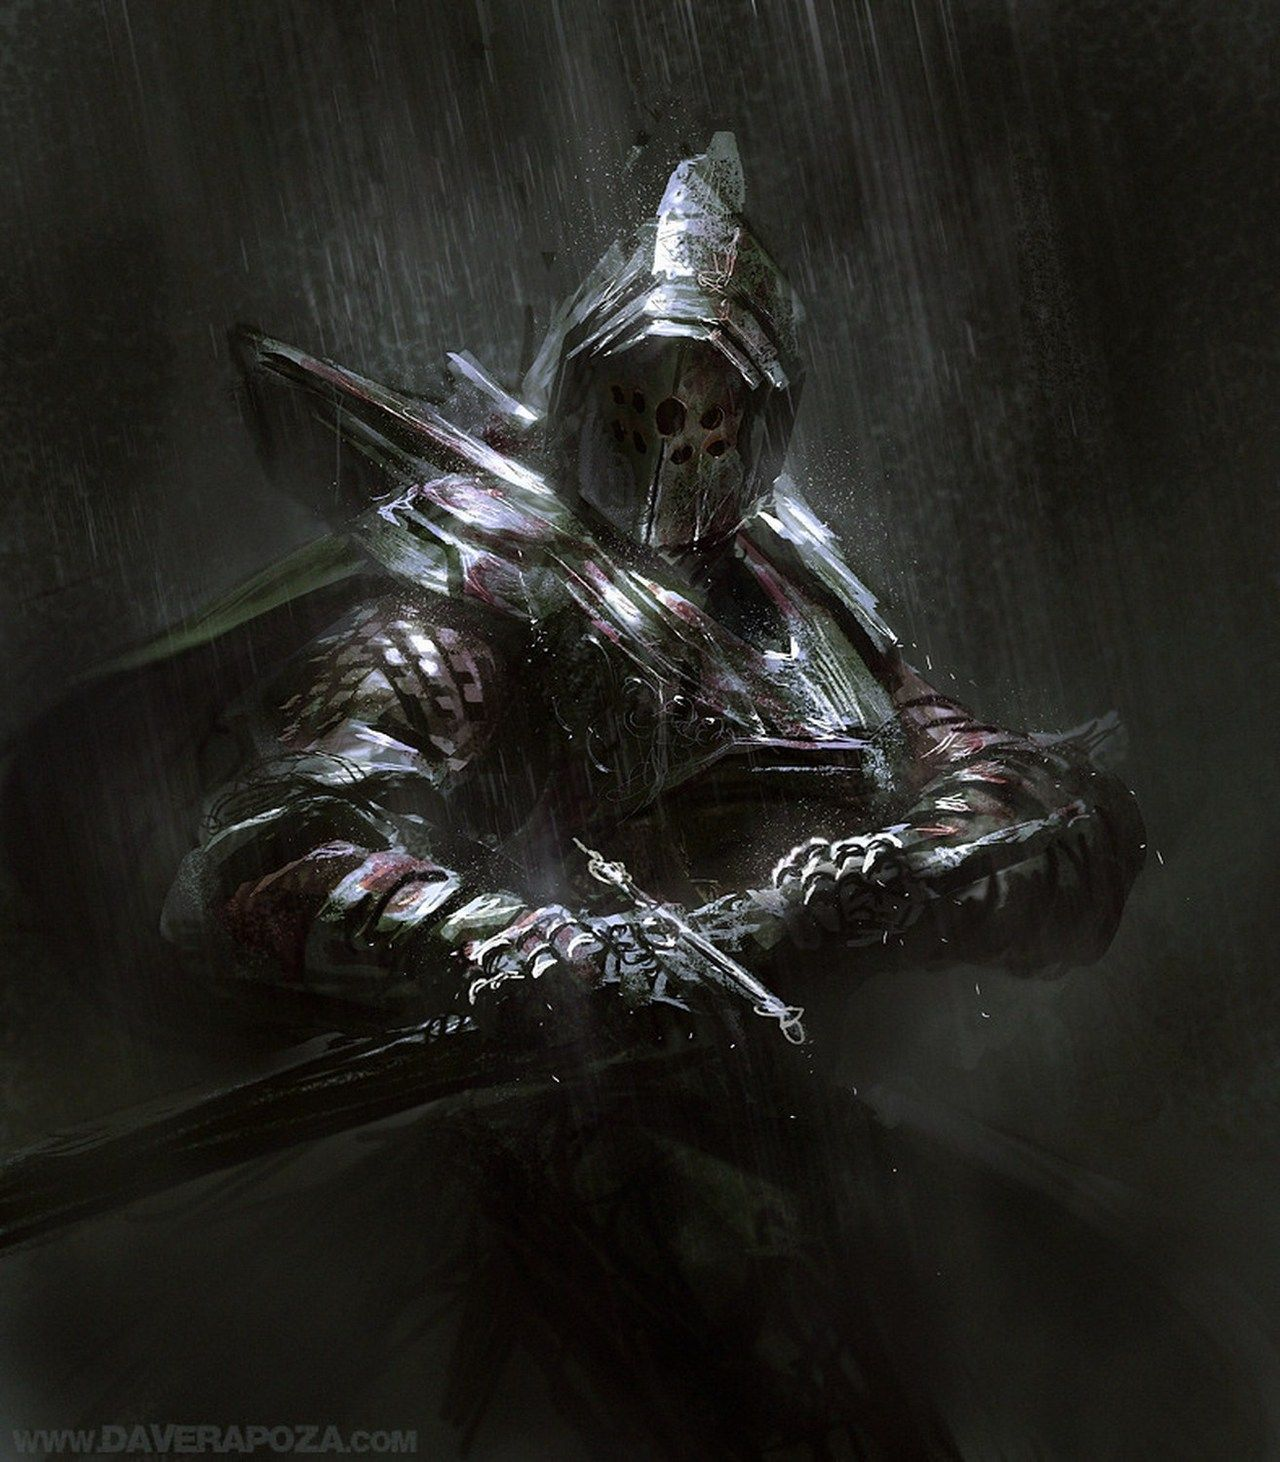 Dark Souls Character Design Process : Dark souls knights the lighting and shading make